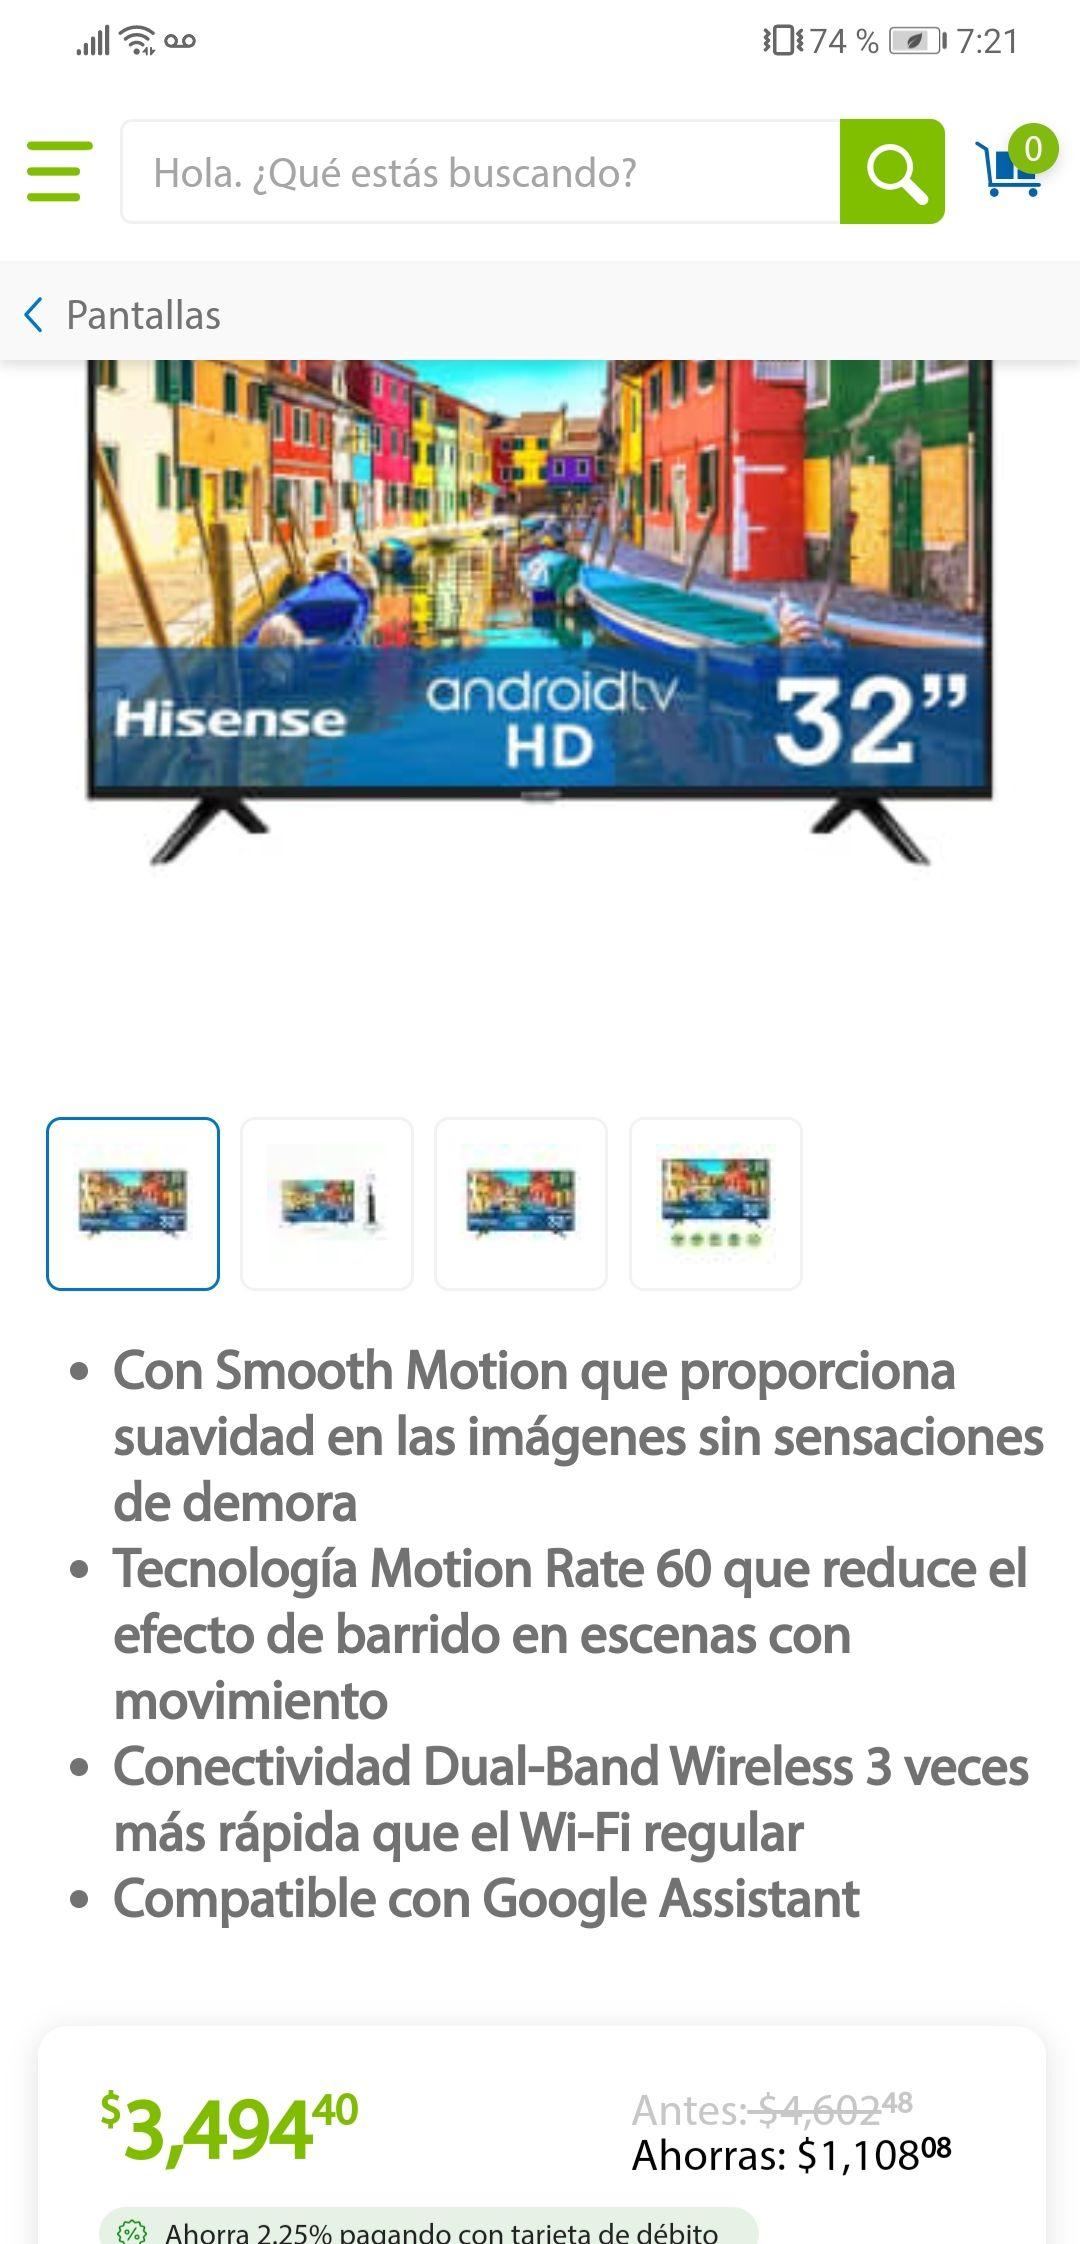 "Sams Club: Hisense android tv 32"""